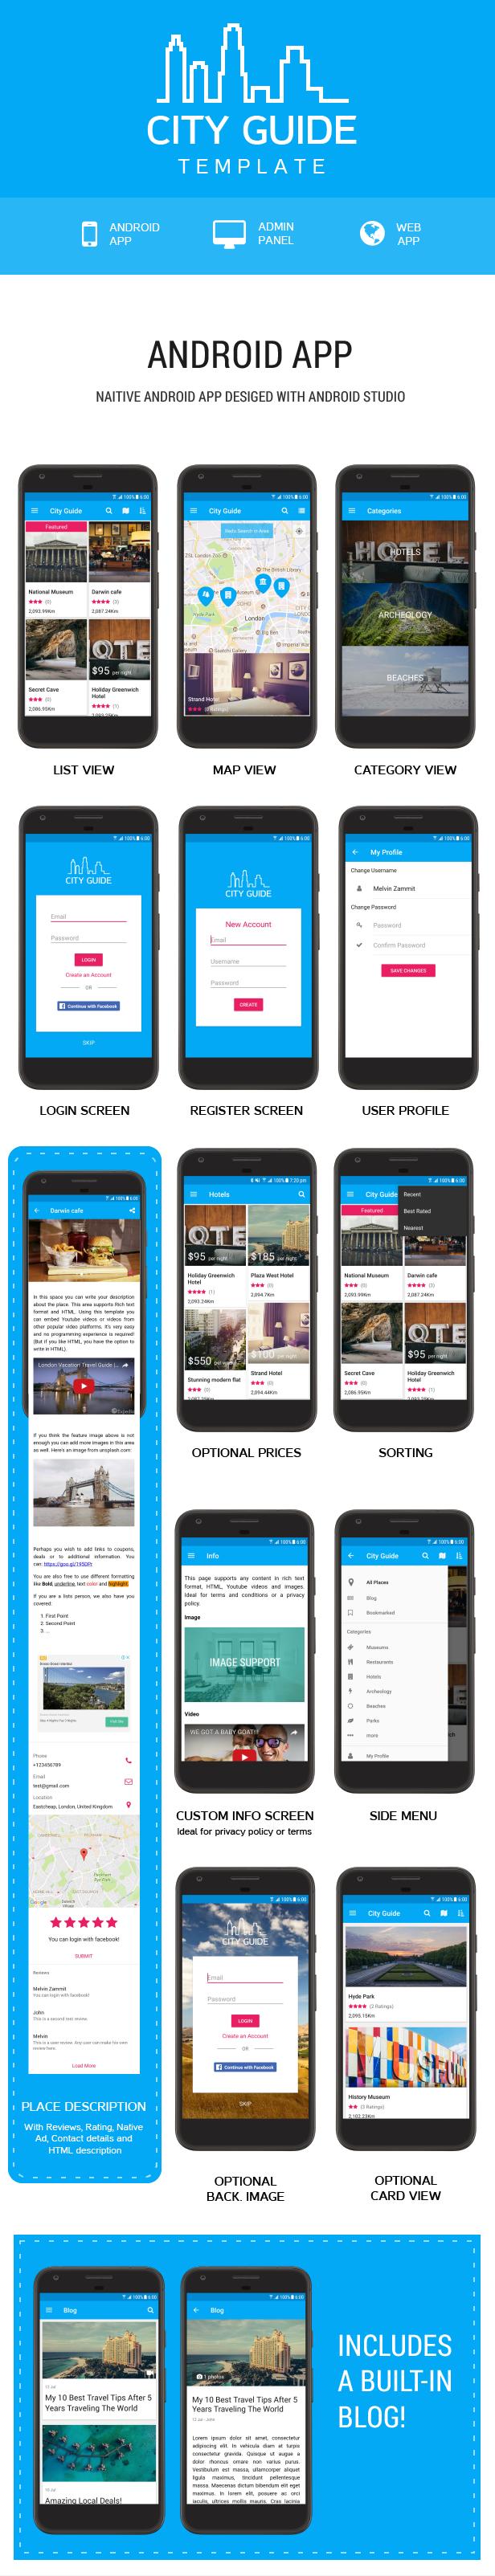 Templat Aplikasi Panduan Kota Terbaik - 5